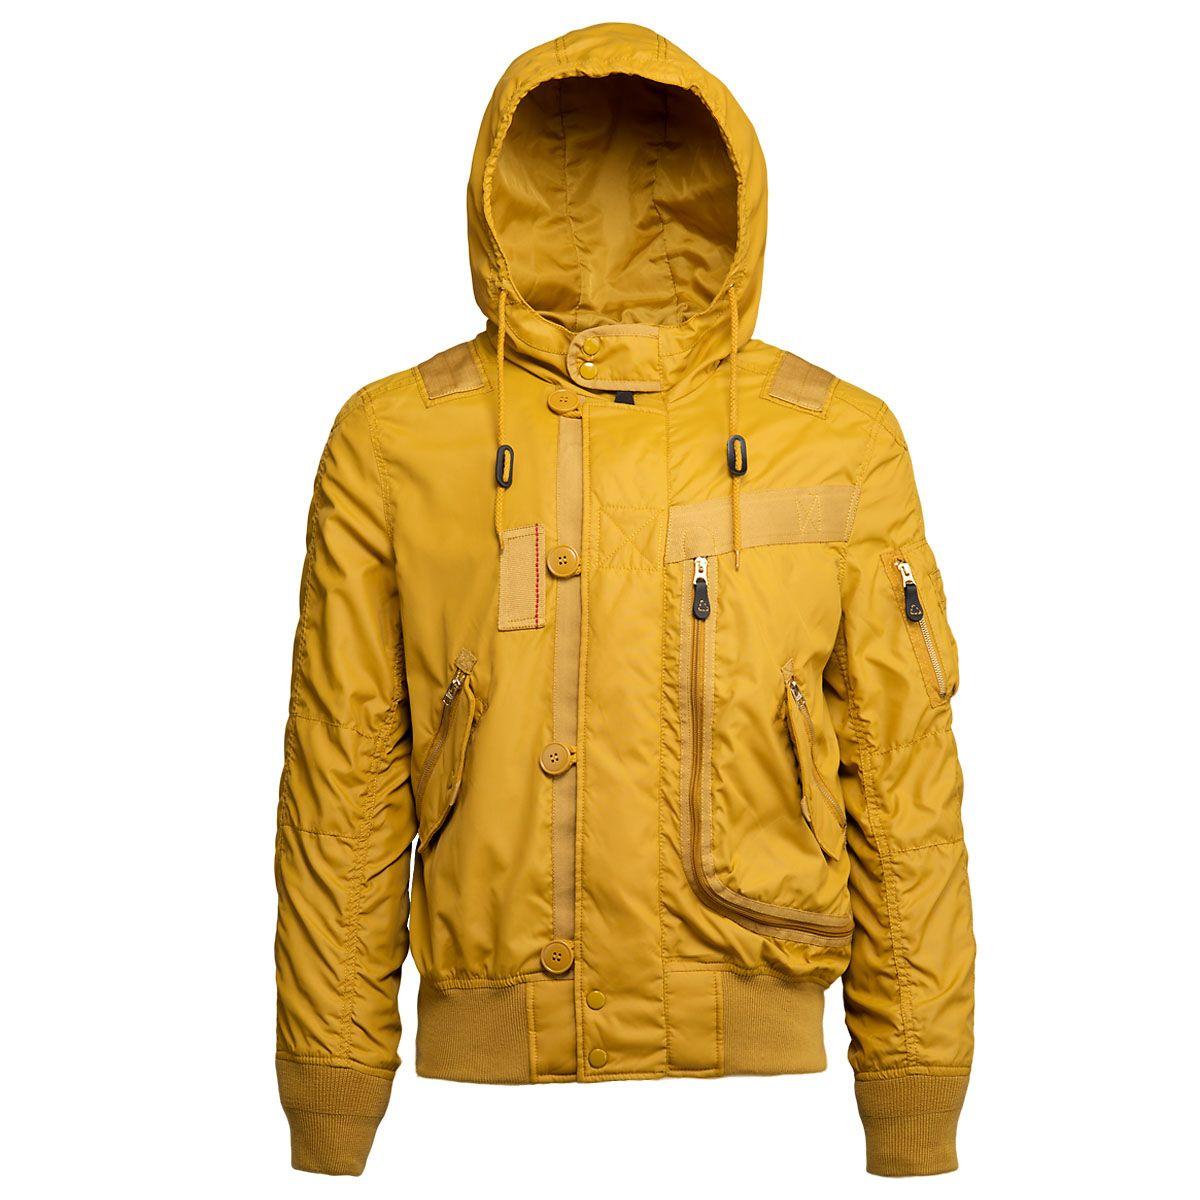 Helo Bomber Utility Jacket Mens flight jacket, Casual